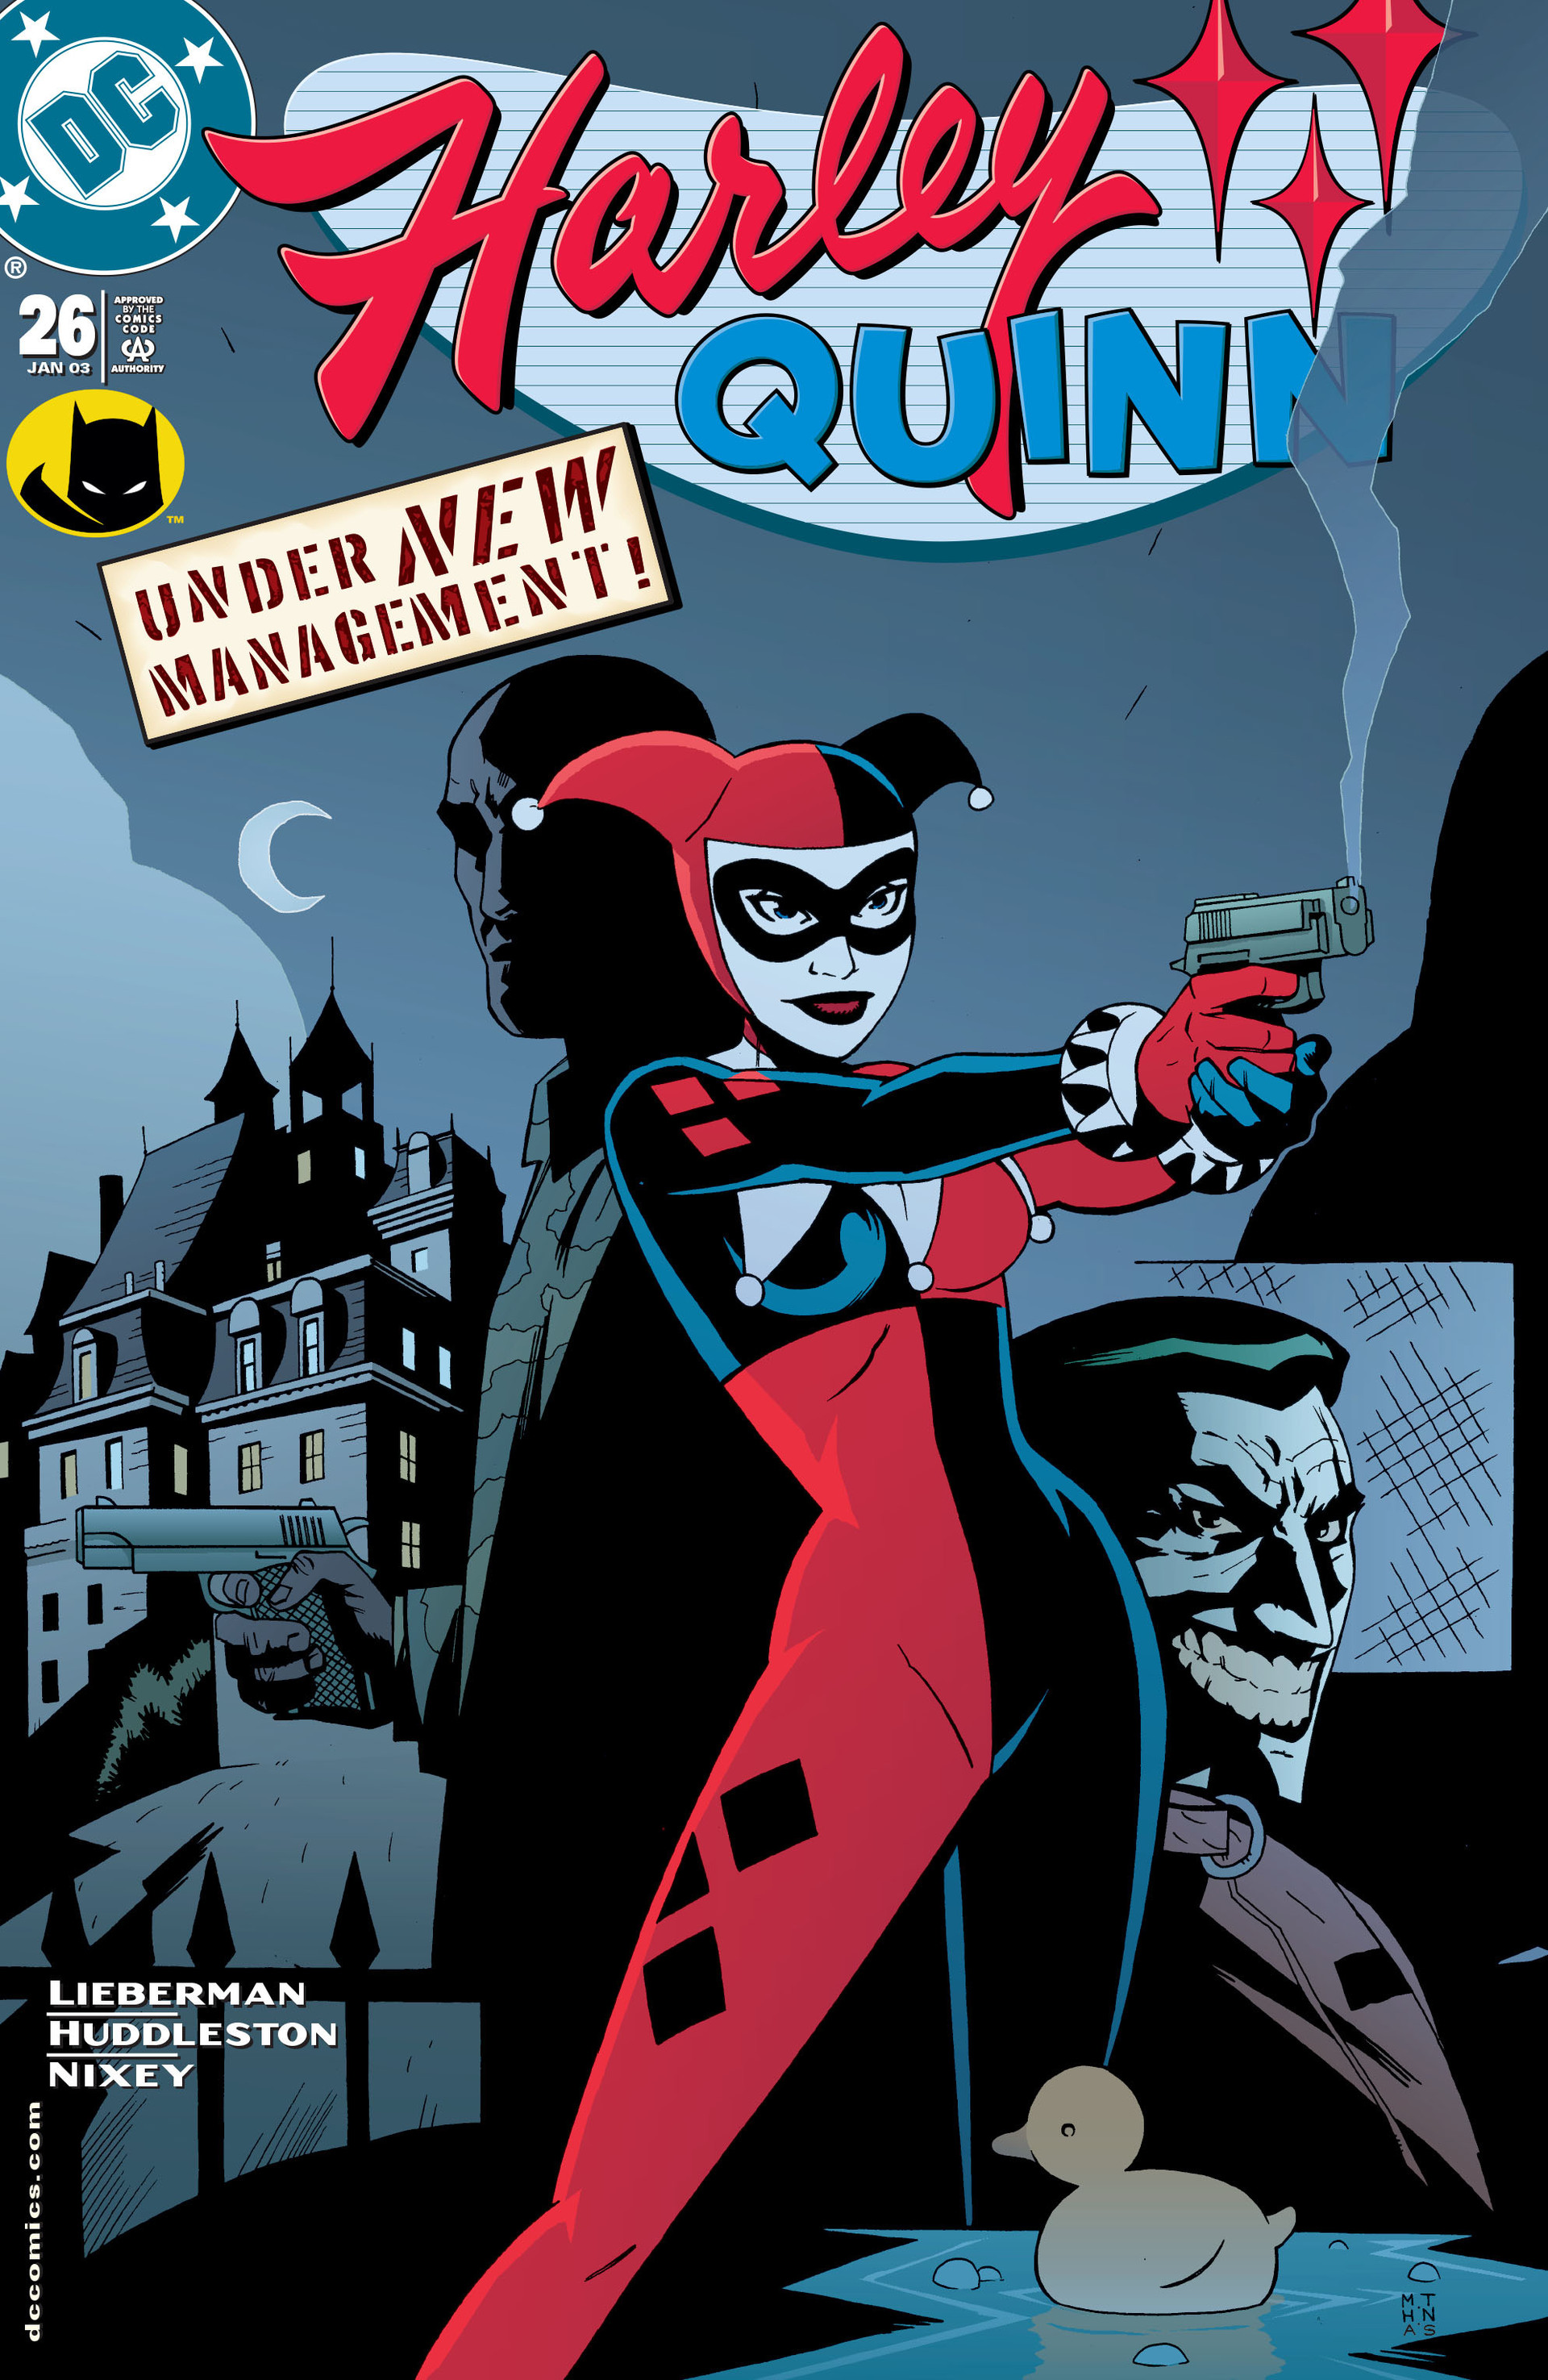 Harley Quinn Vol.1 #26